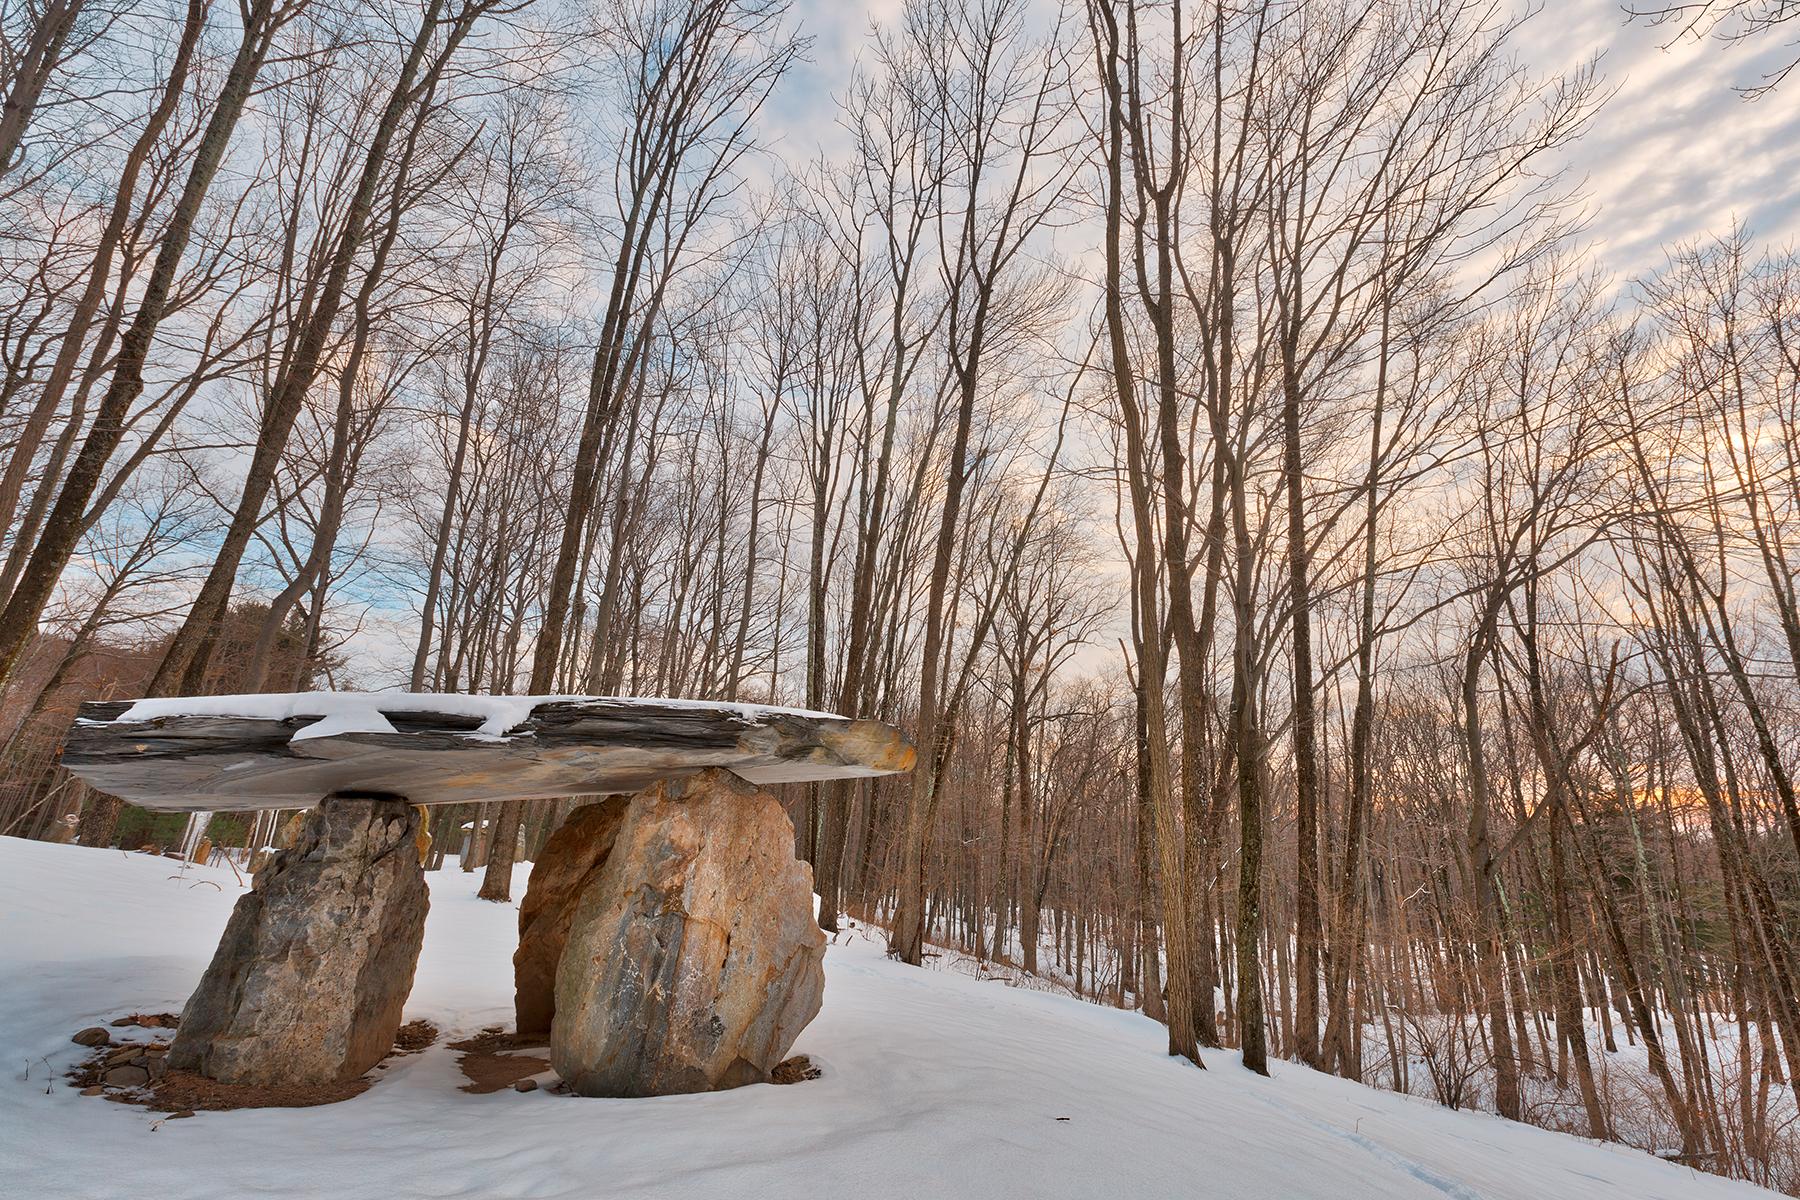 Winter dolmen forest - hdr photo